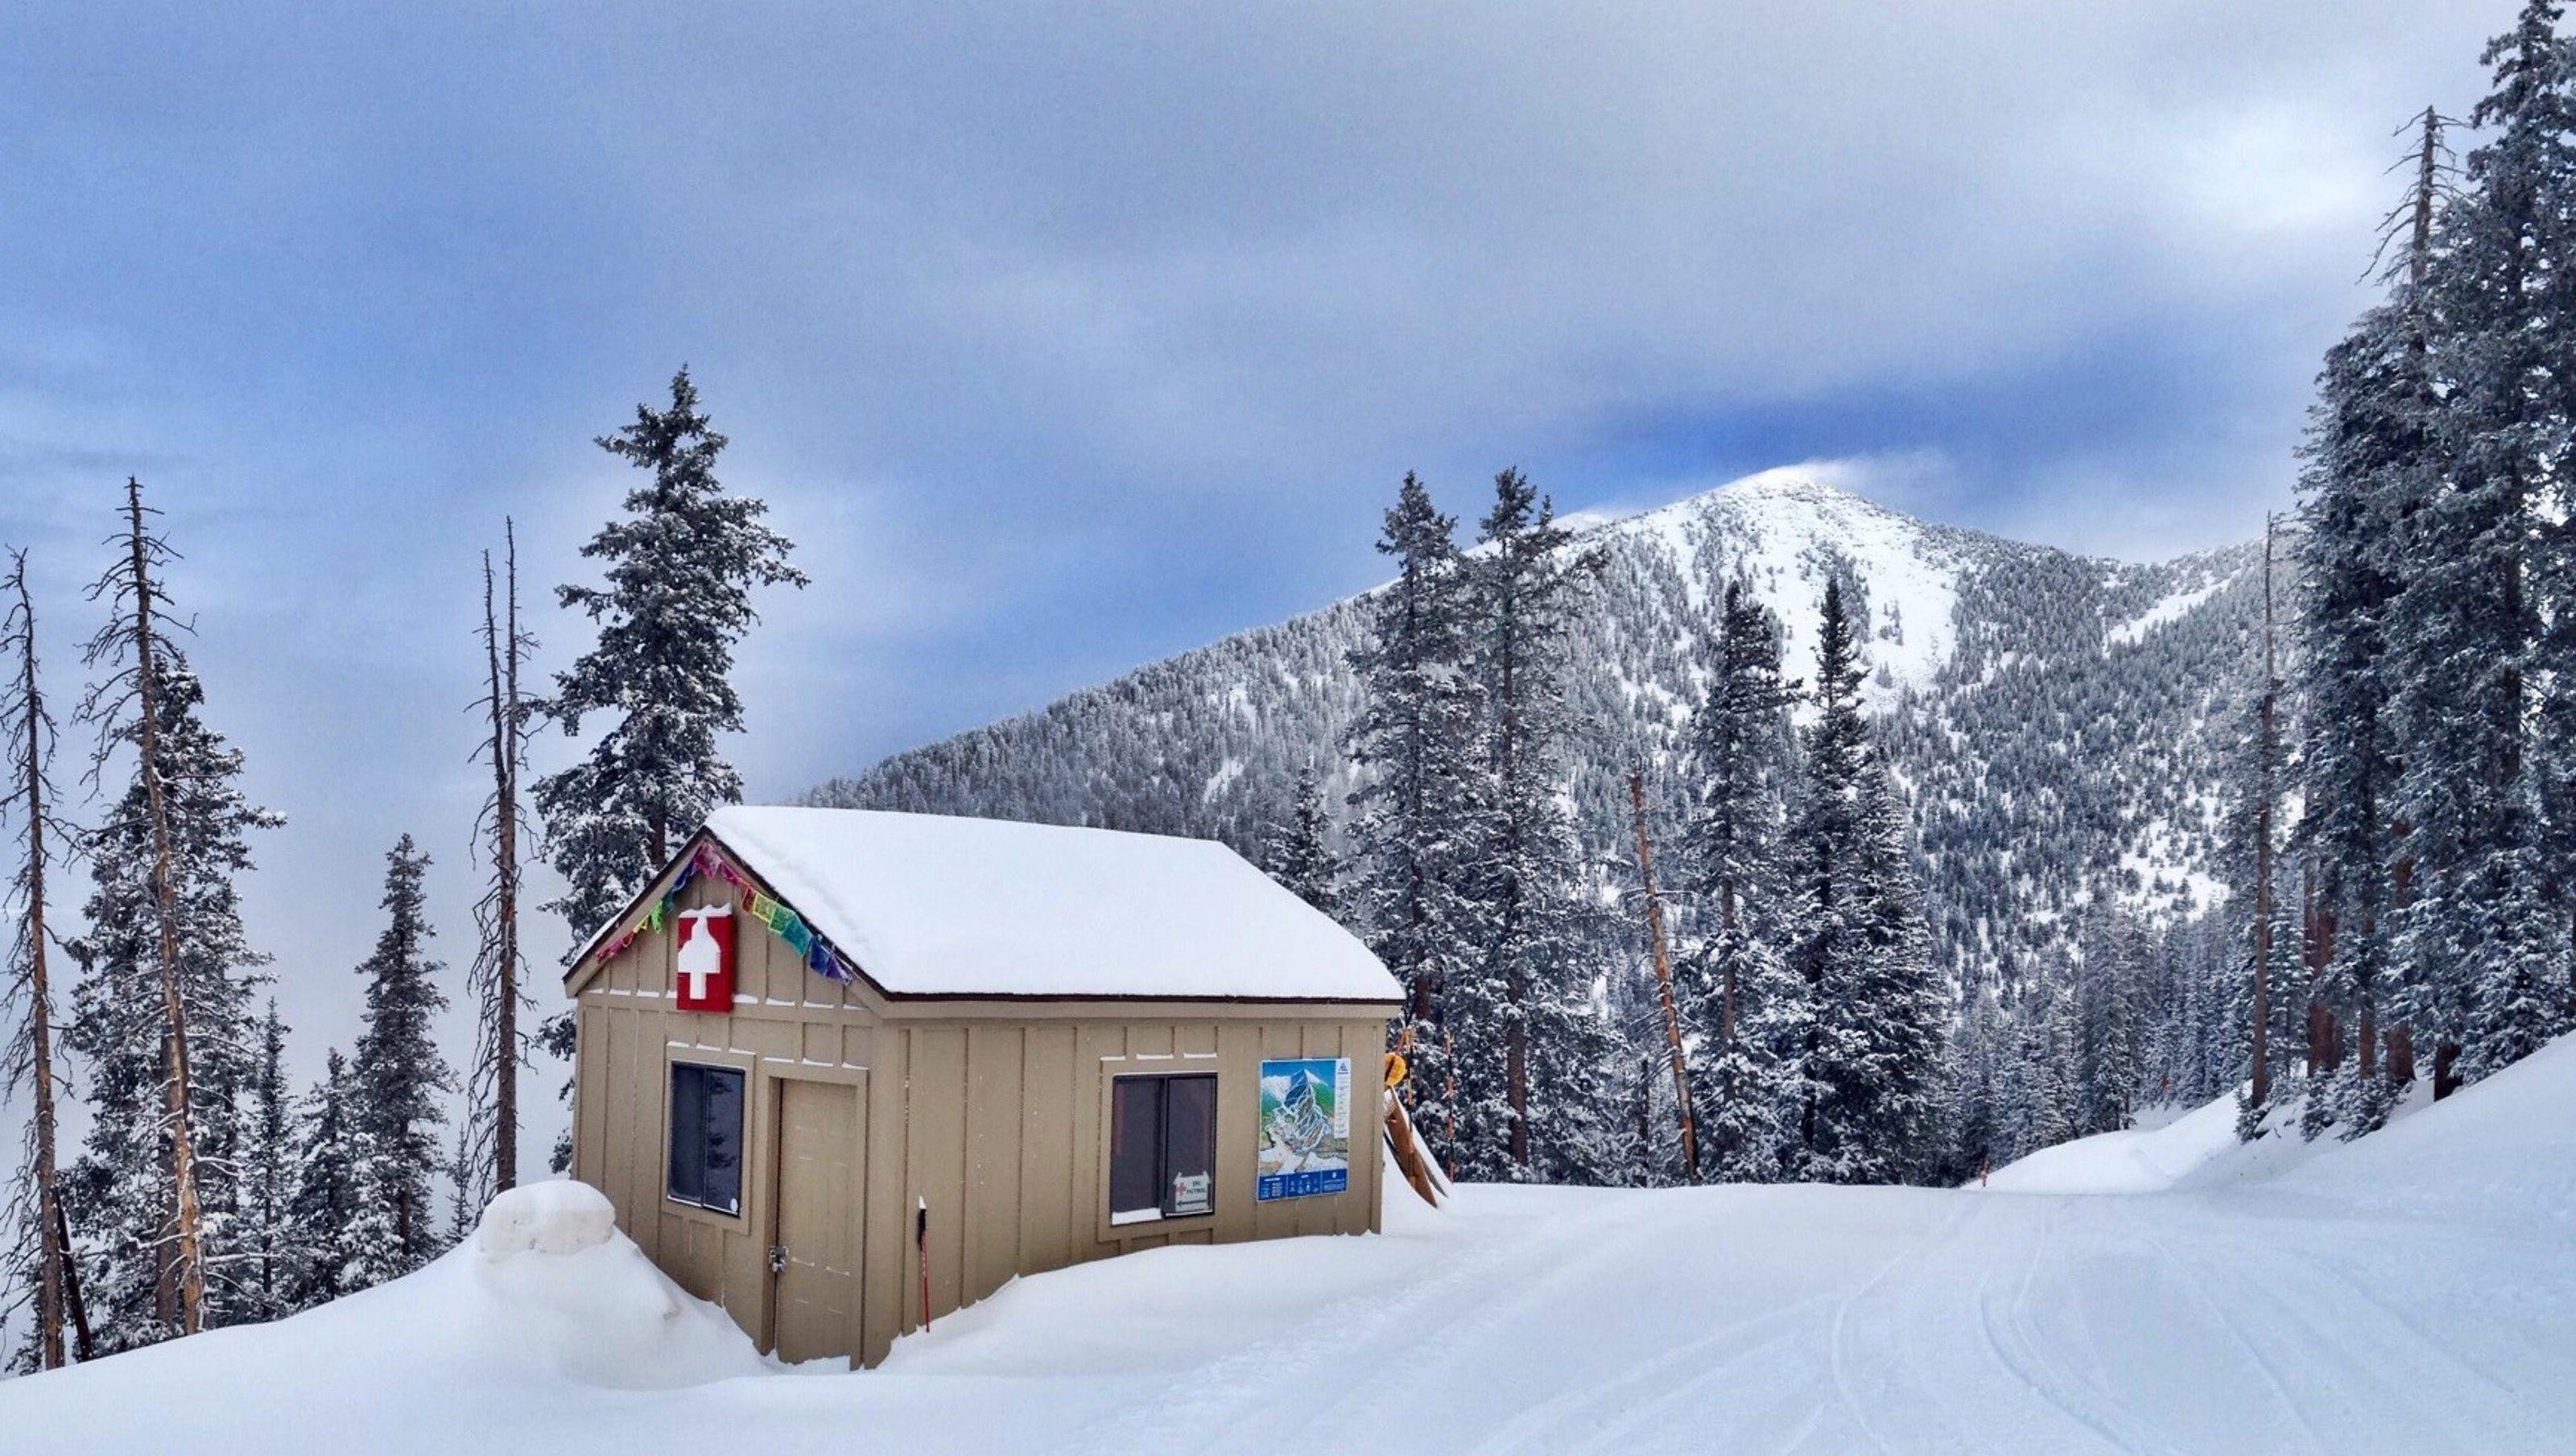 arizona ski resorts: snowbowl and sunrise park report fresh snow